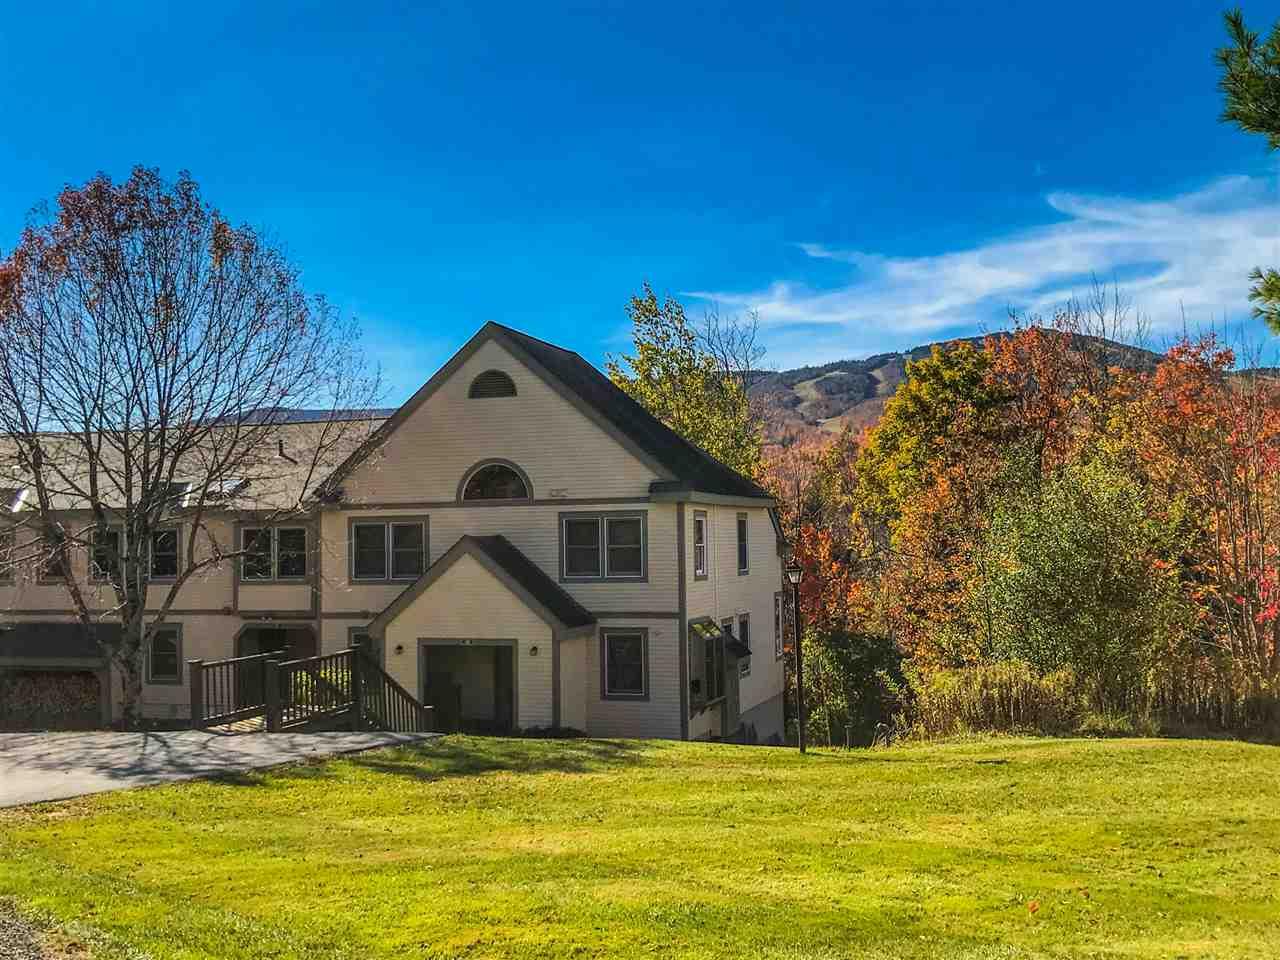 Mount-Snow-Real-Estate-4617772-18